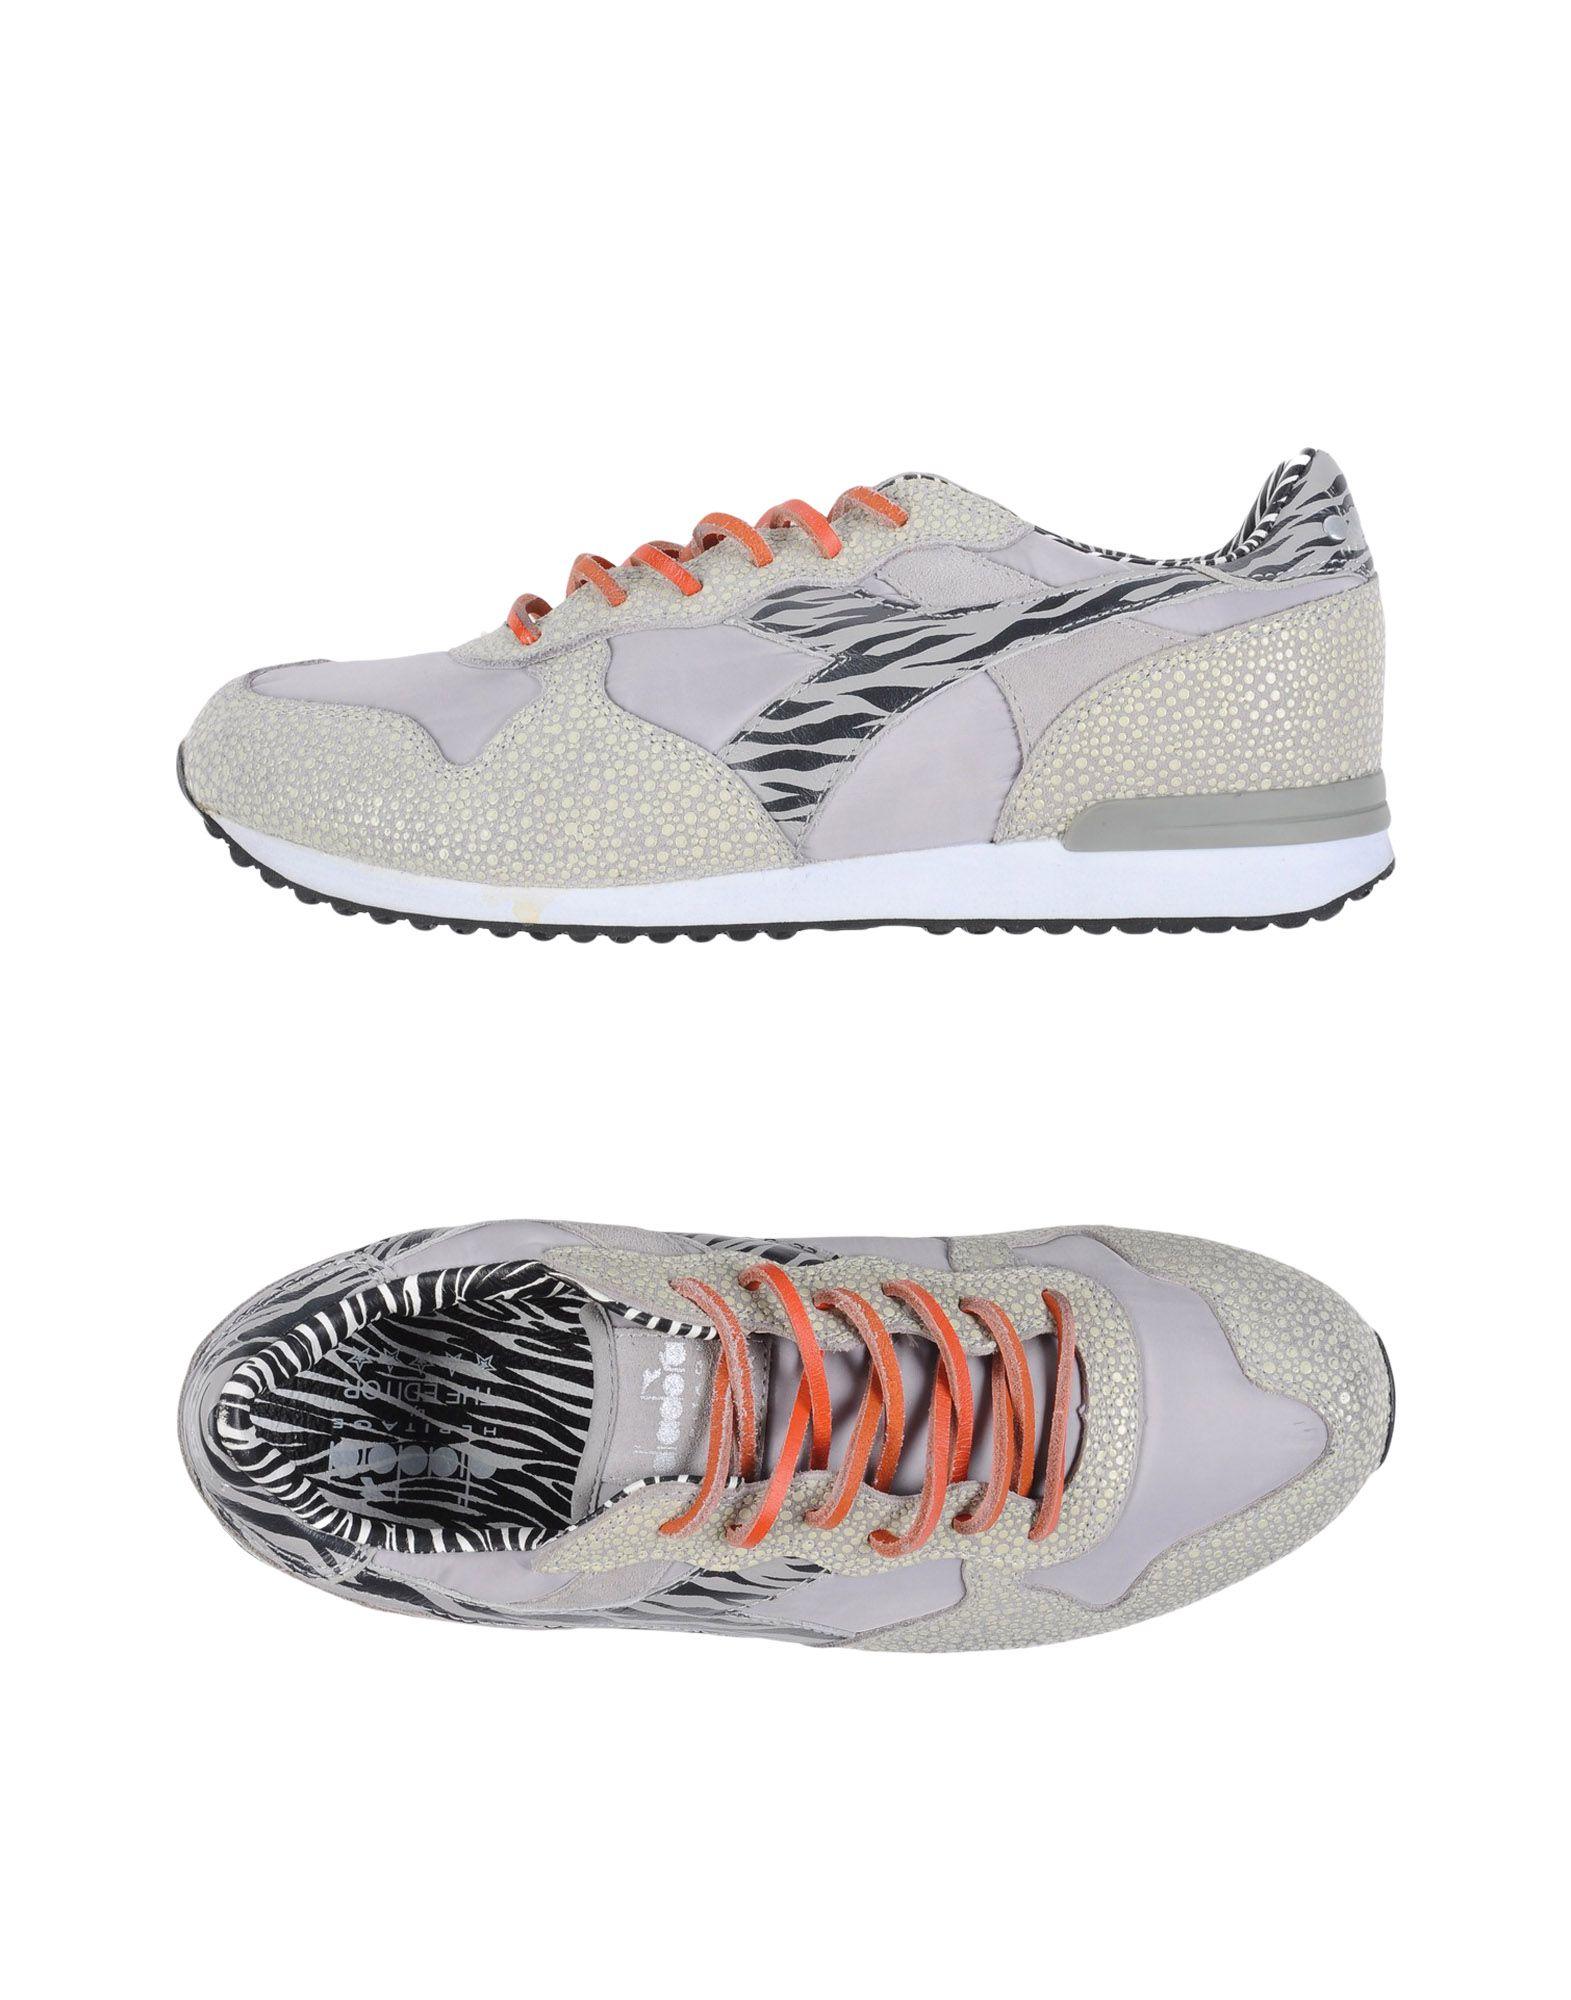 Diadora Heritage By The Editor Editor Editor Sneakers Herren  11173226FG Heiße Schuhe 0d3186